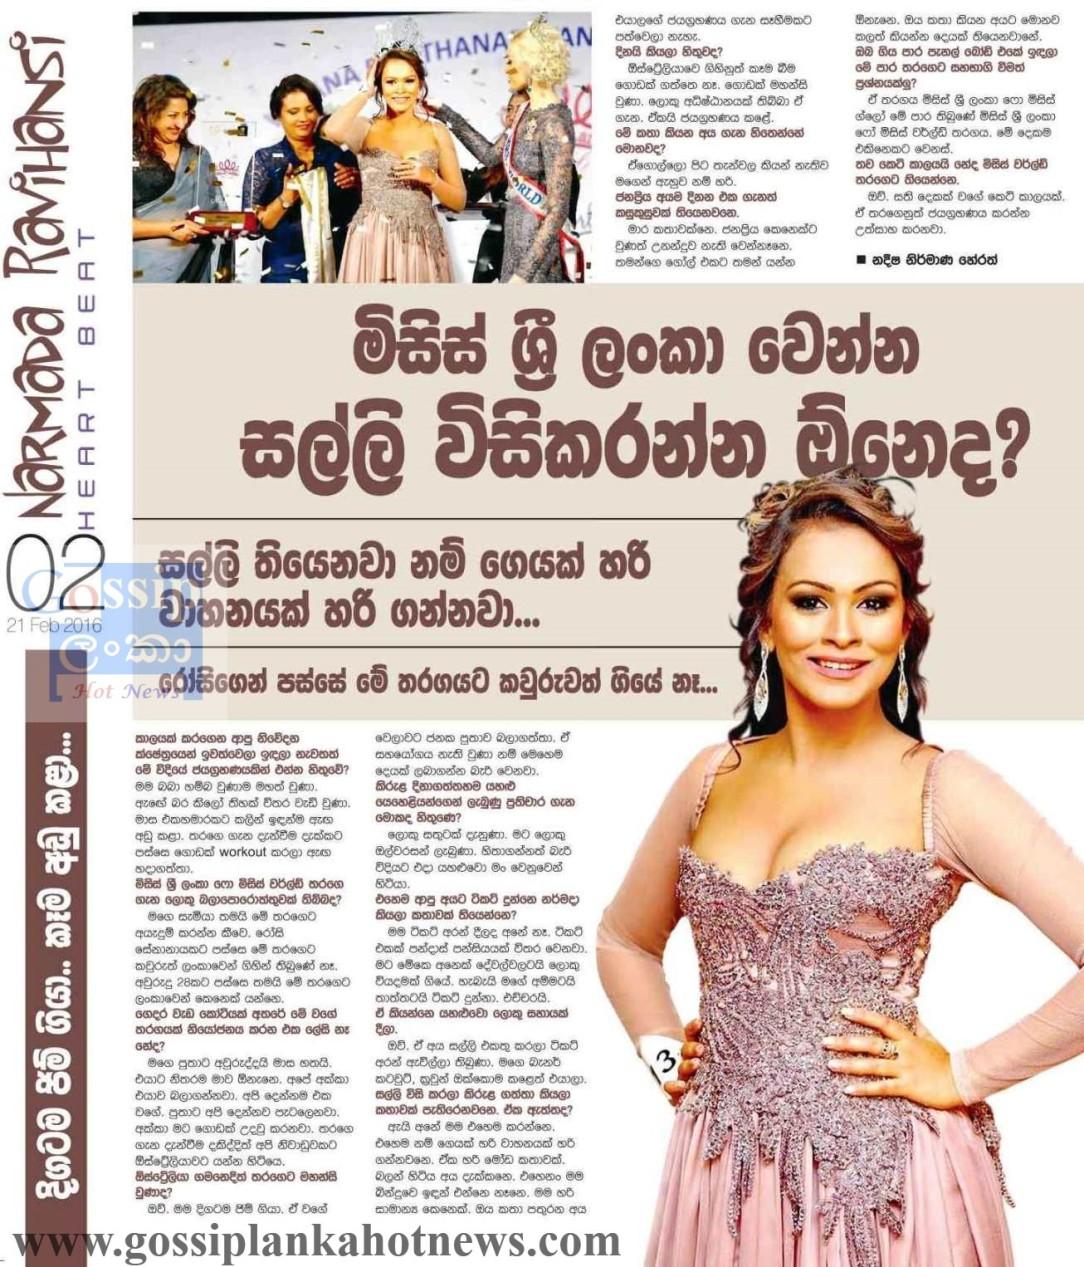 Narmada Yapa Abeywardena was crowned Mrs Sri Lanka 2016